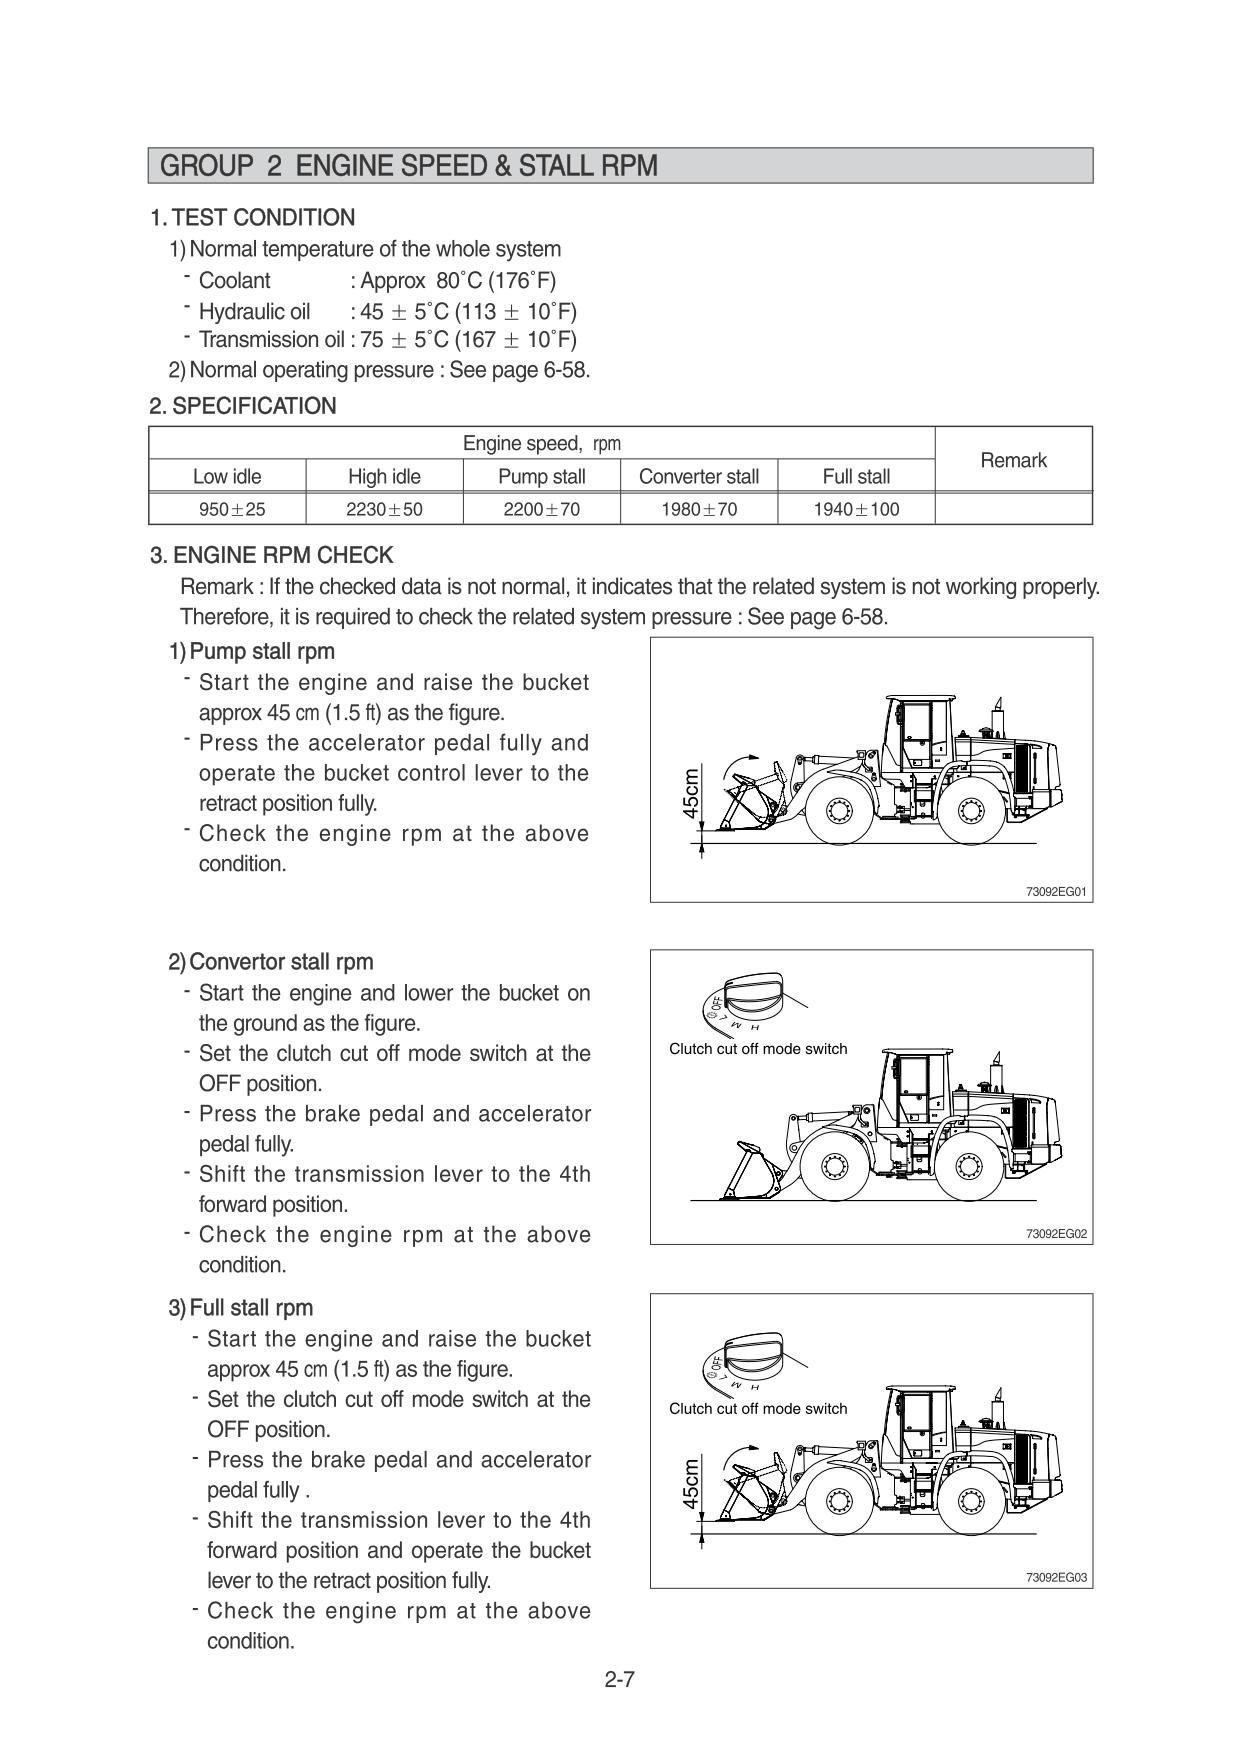 Руководство по ремонту  Hyundai HL730-9,HL730TM-9